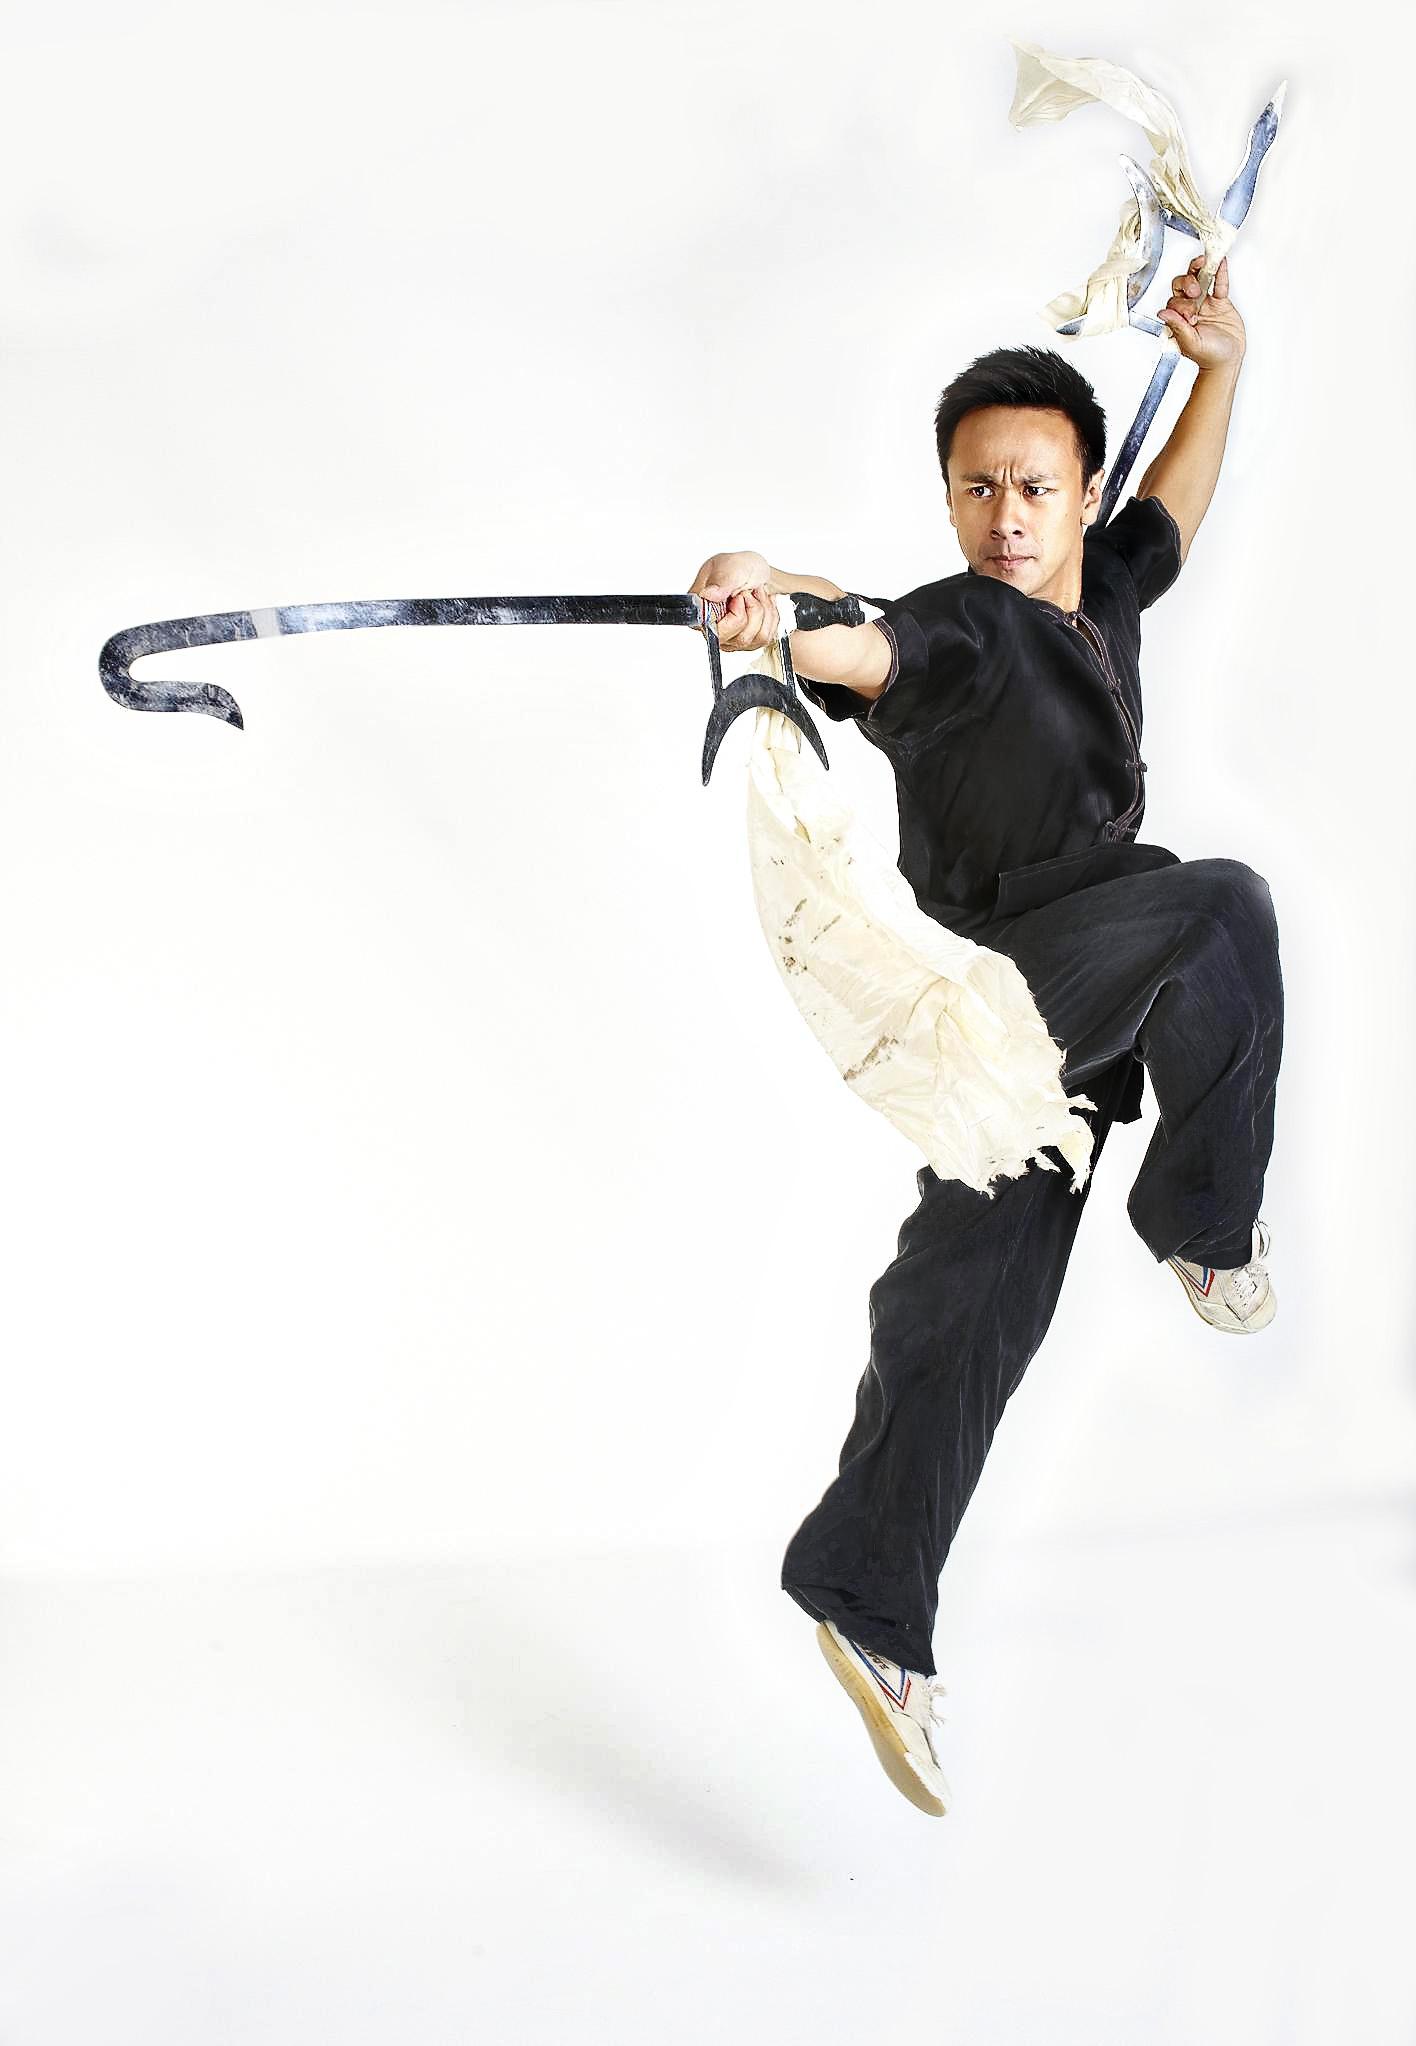 viendong_jump.jpg